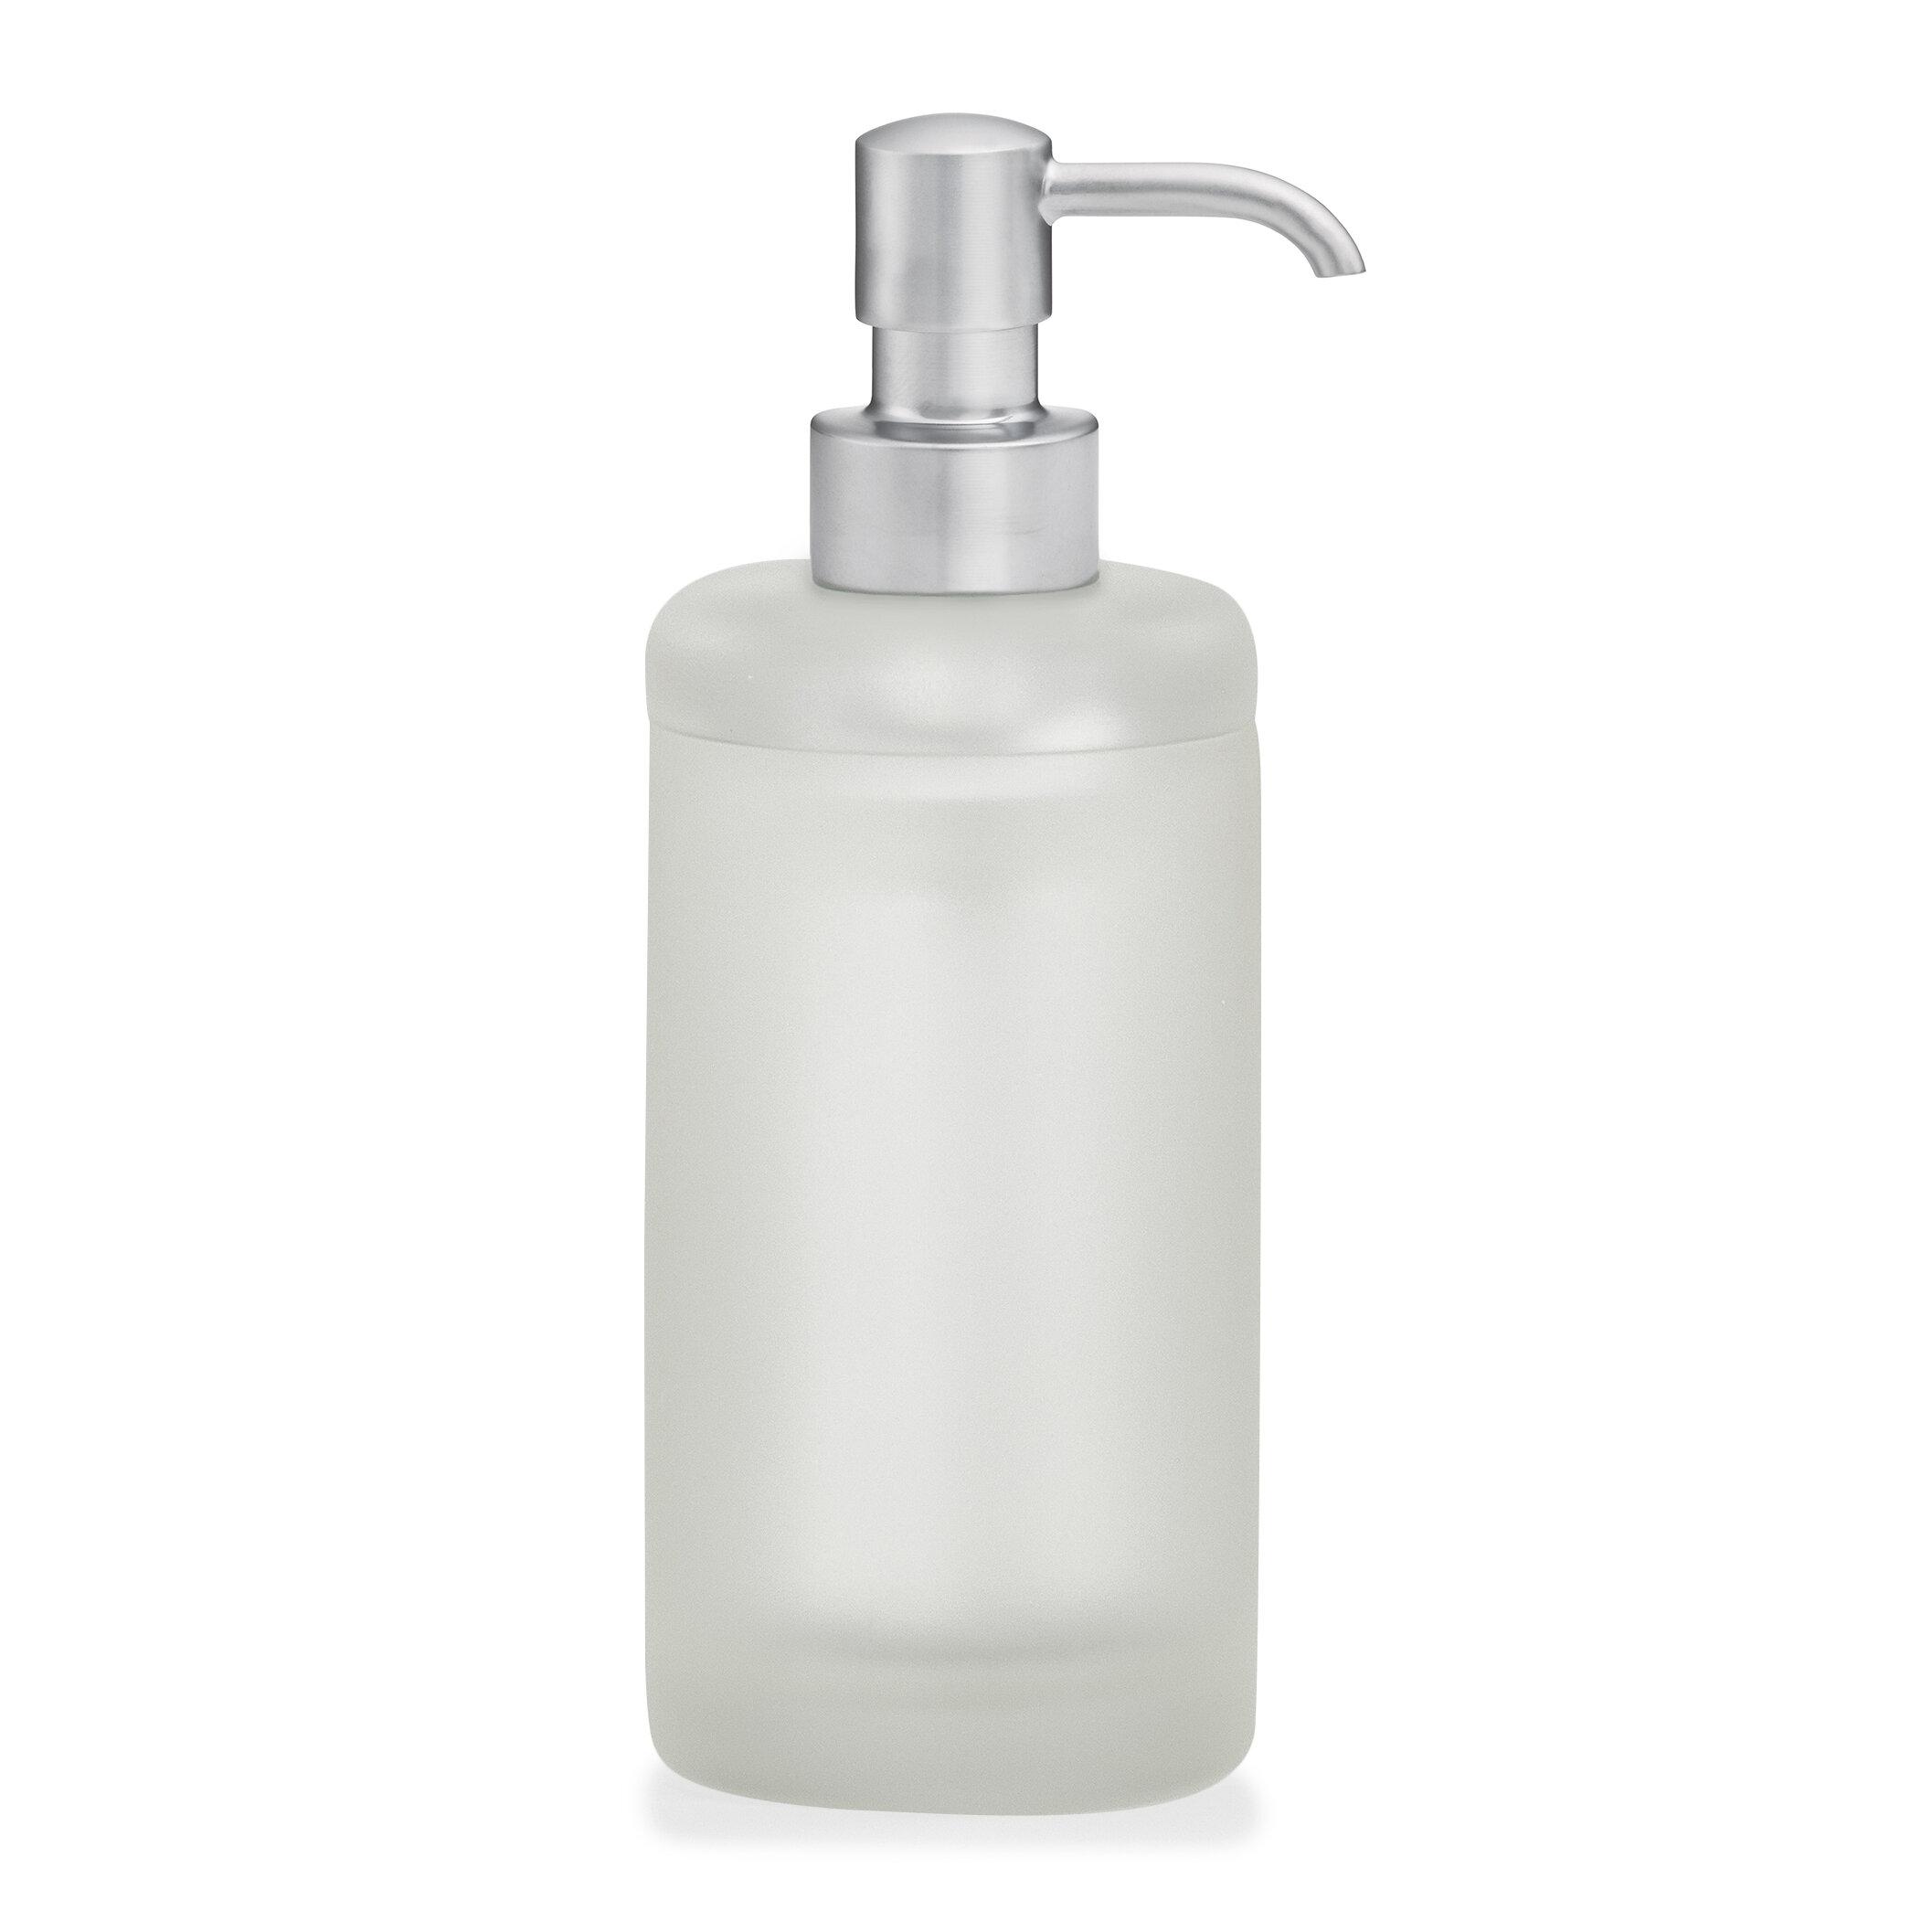 Labrazel Dome Soap Dispenser Wayfair